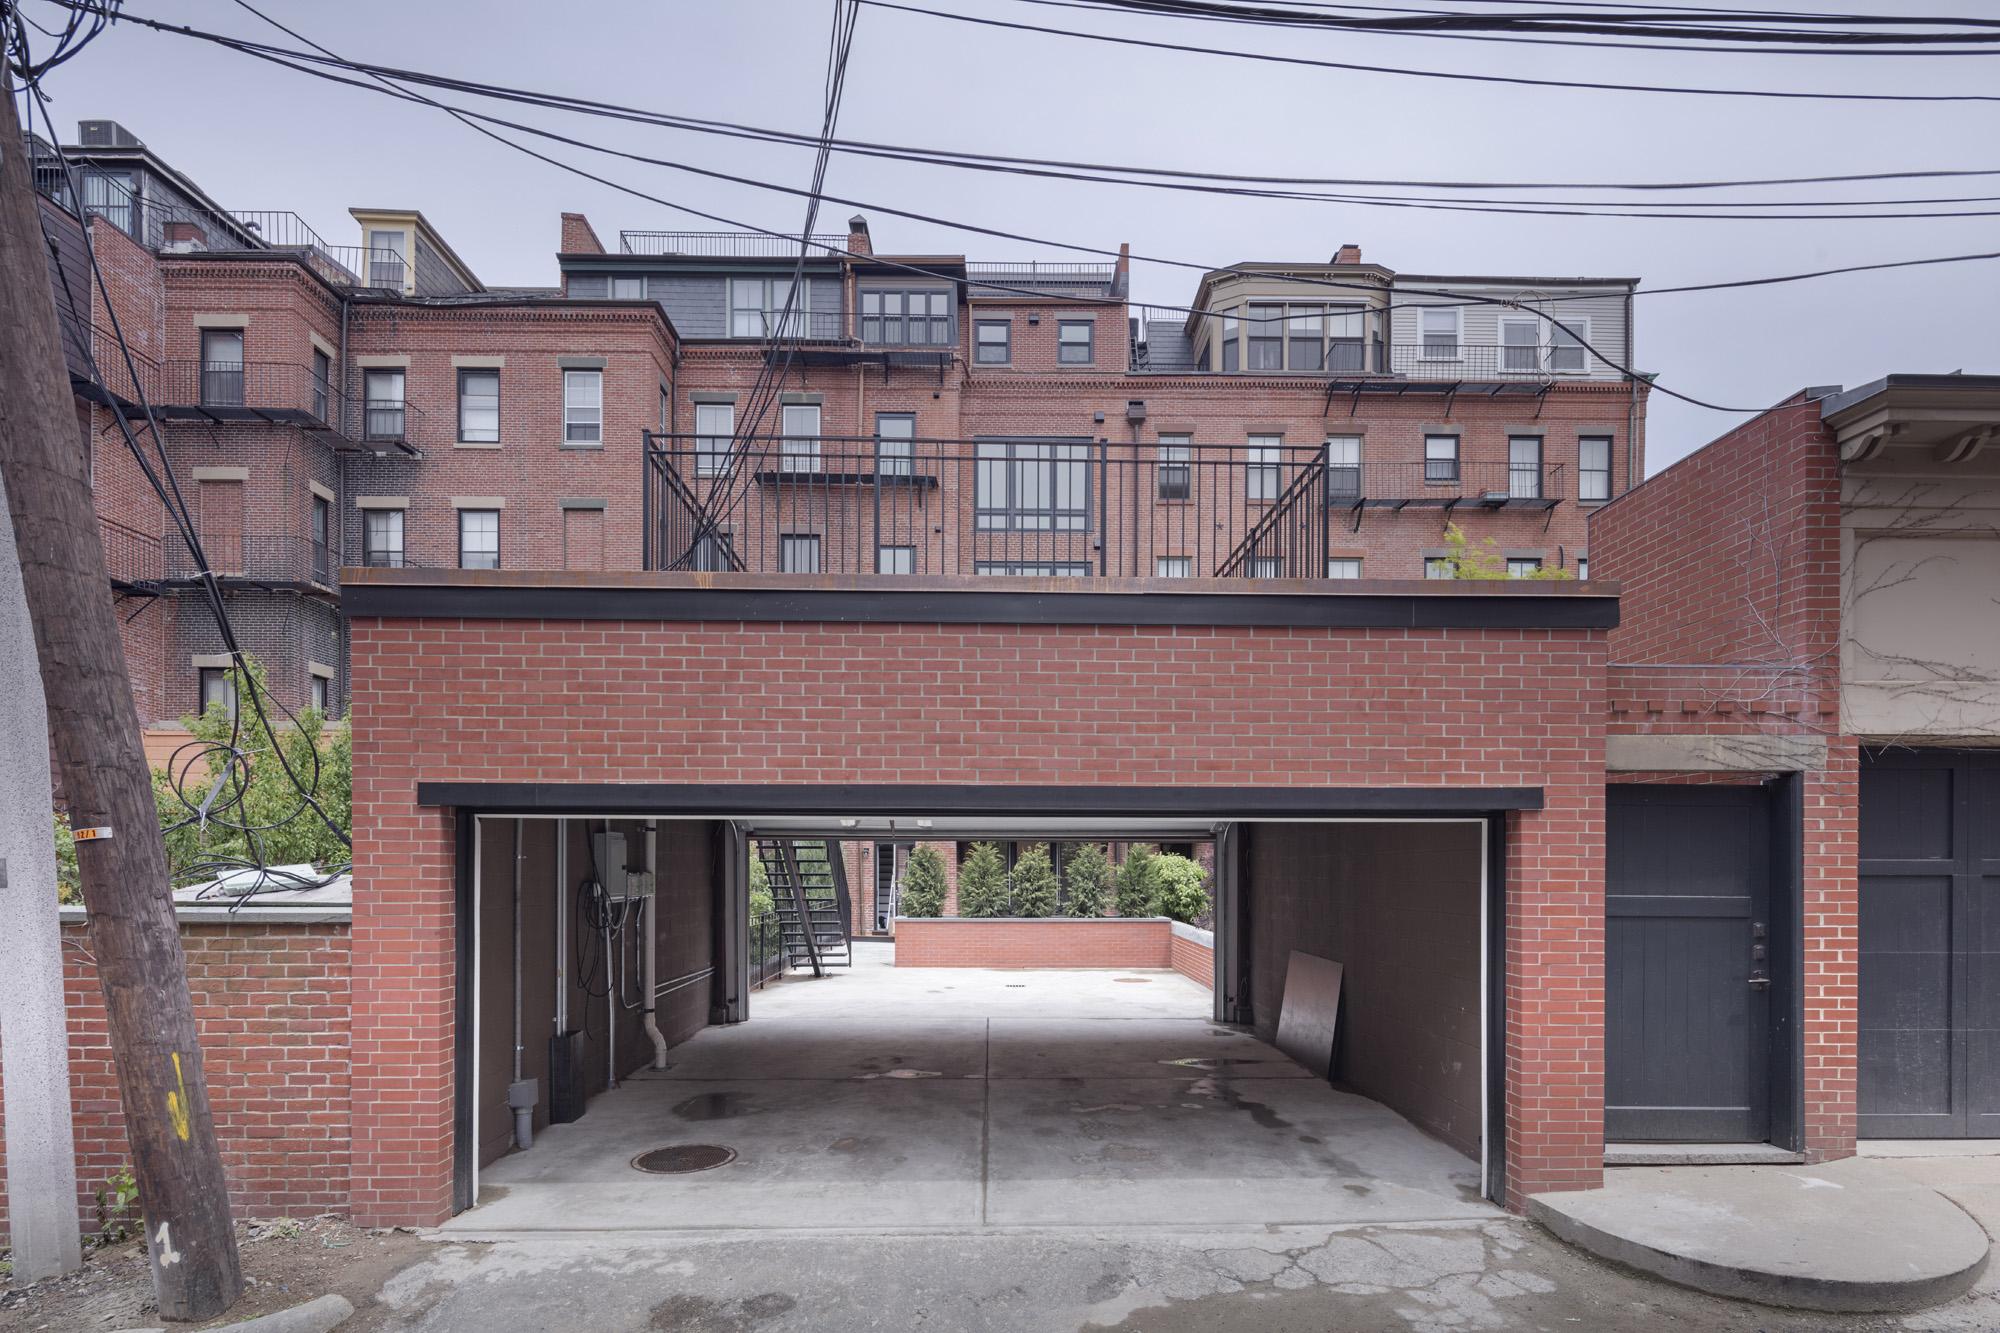 05 Exterior (2).jpg